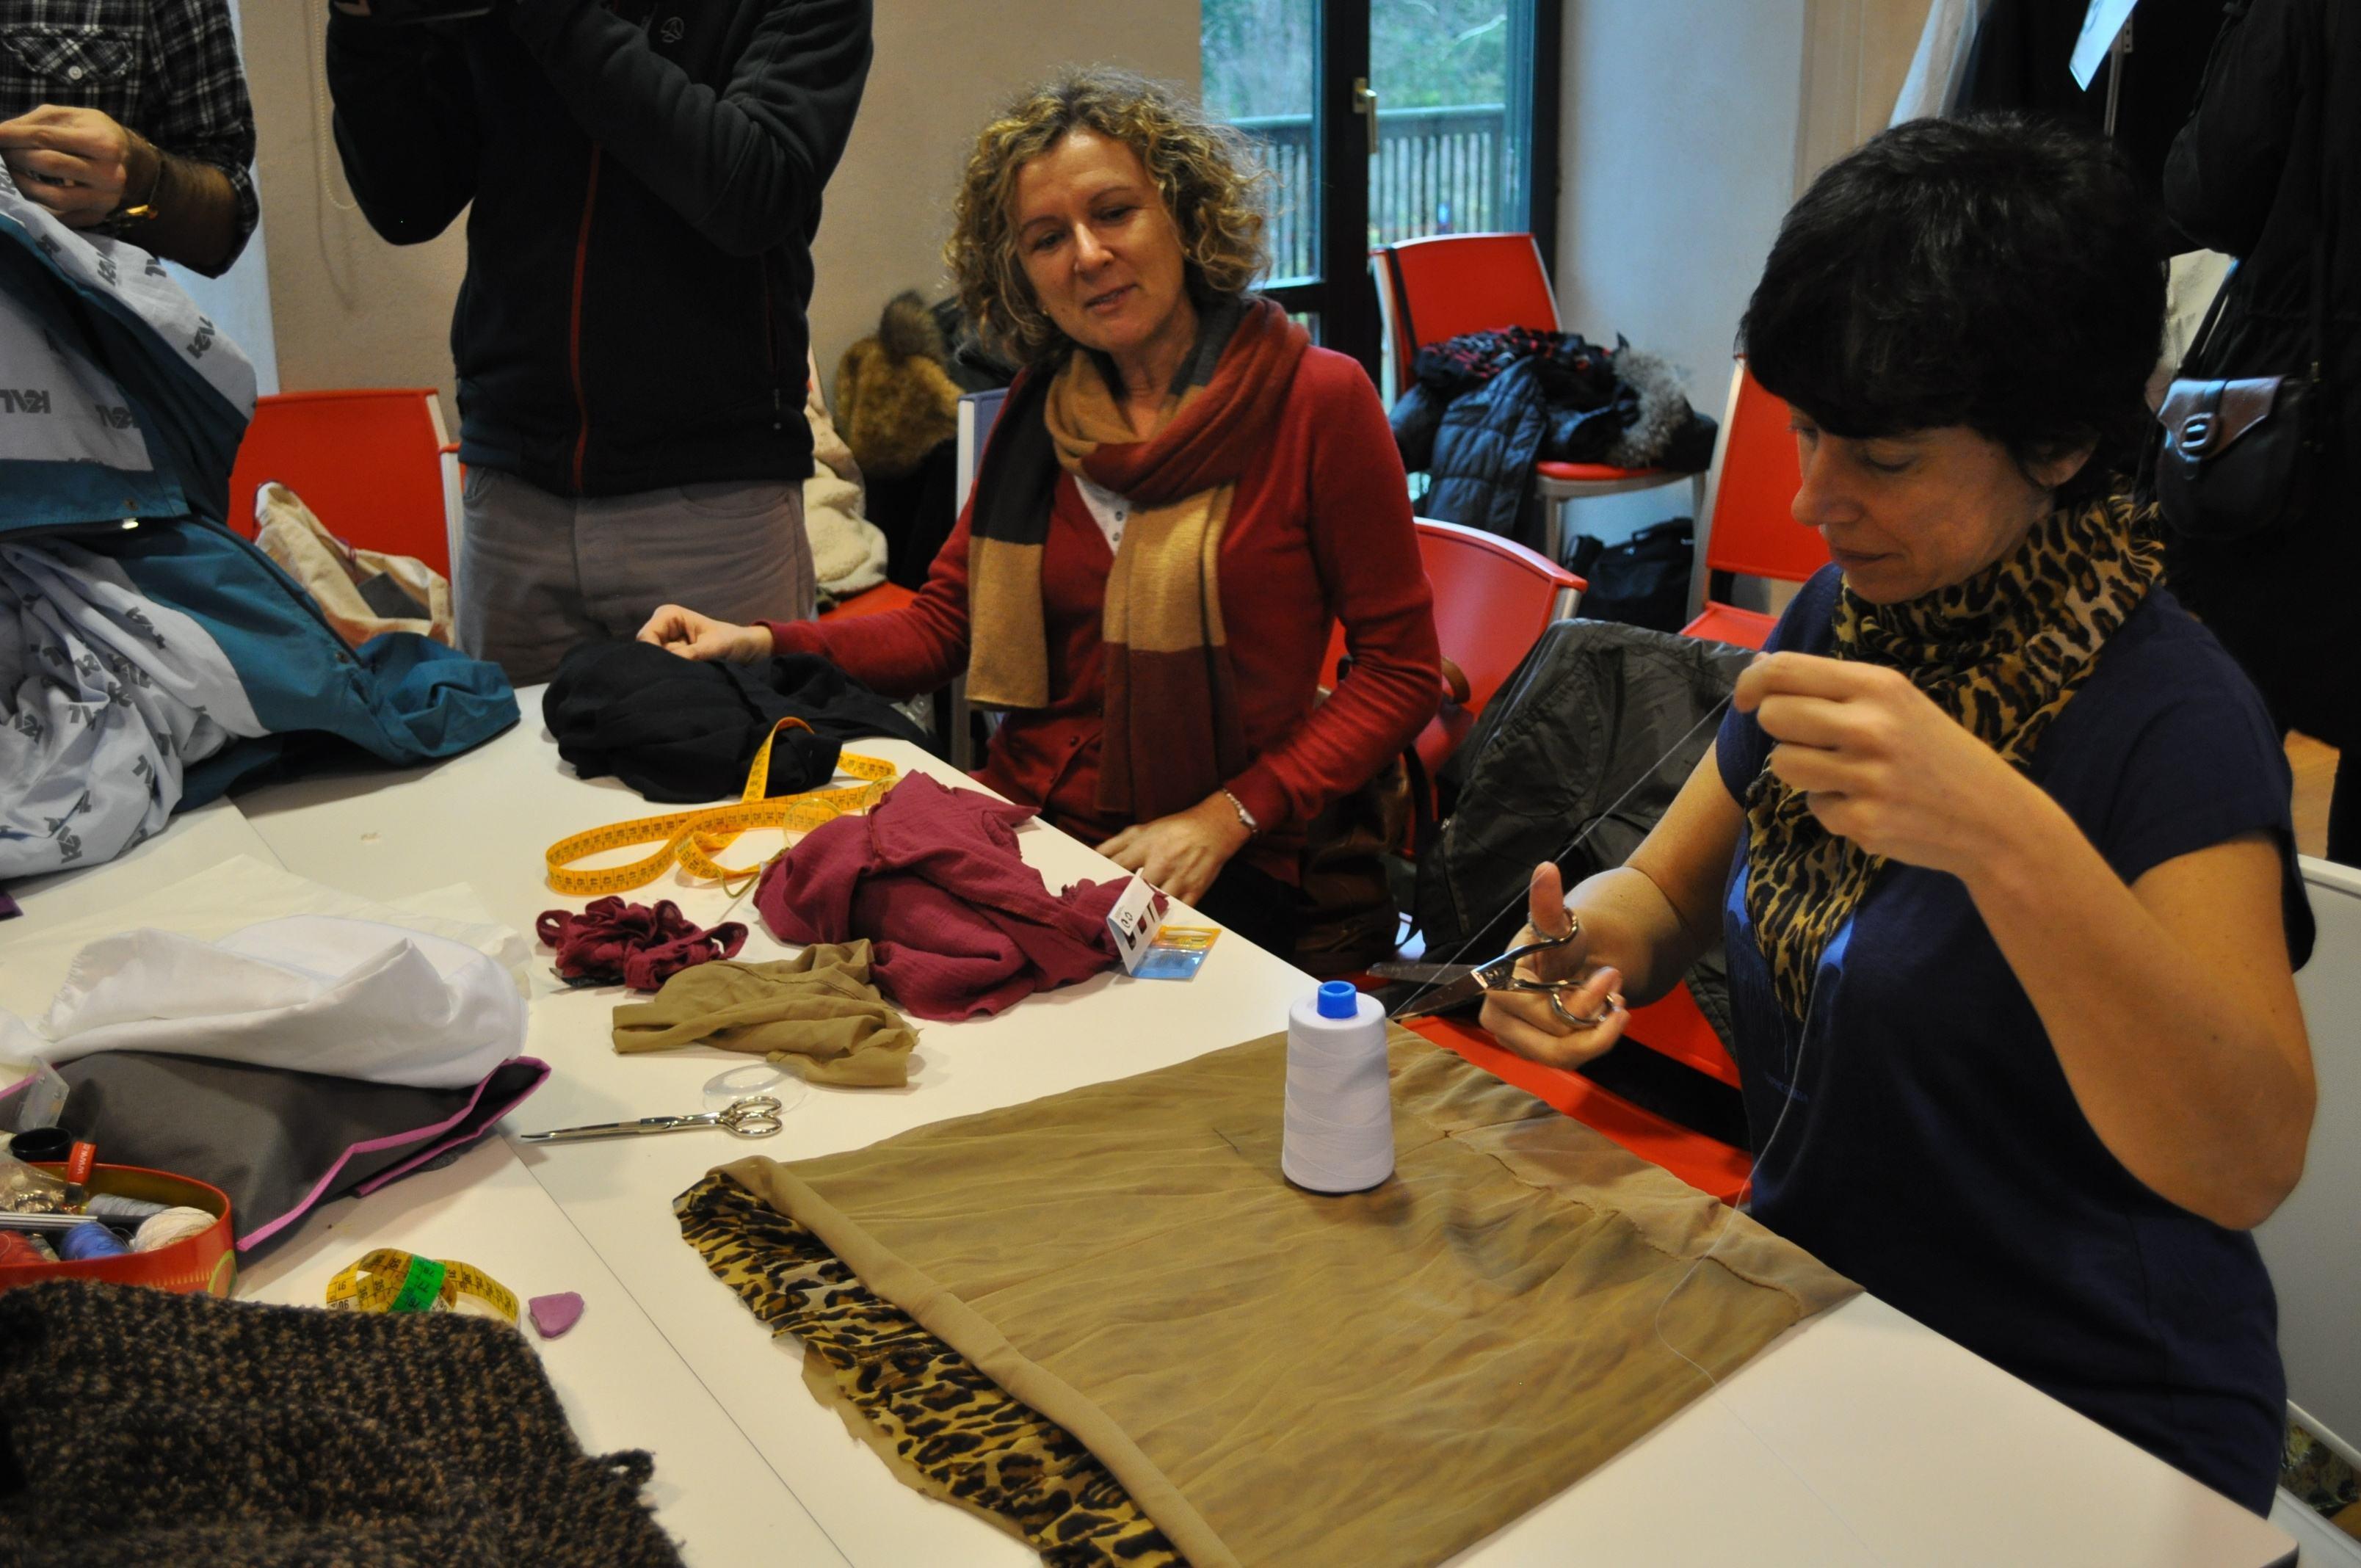 Dos participantes en el taller de costura.